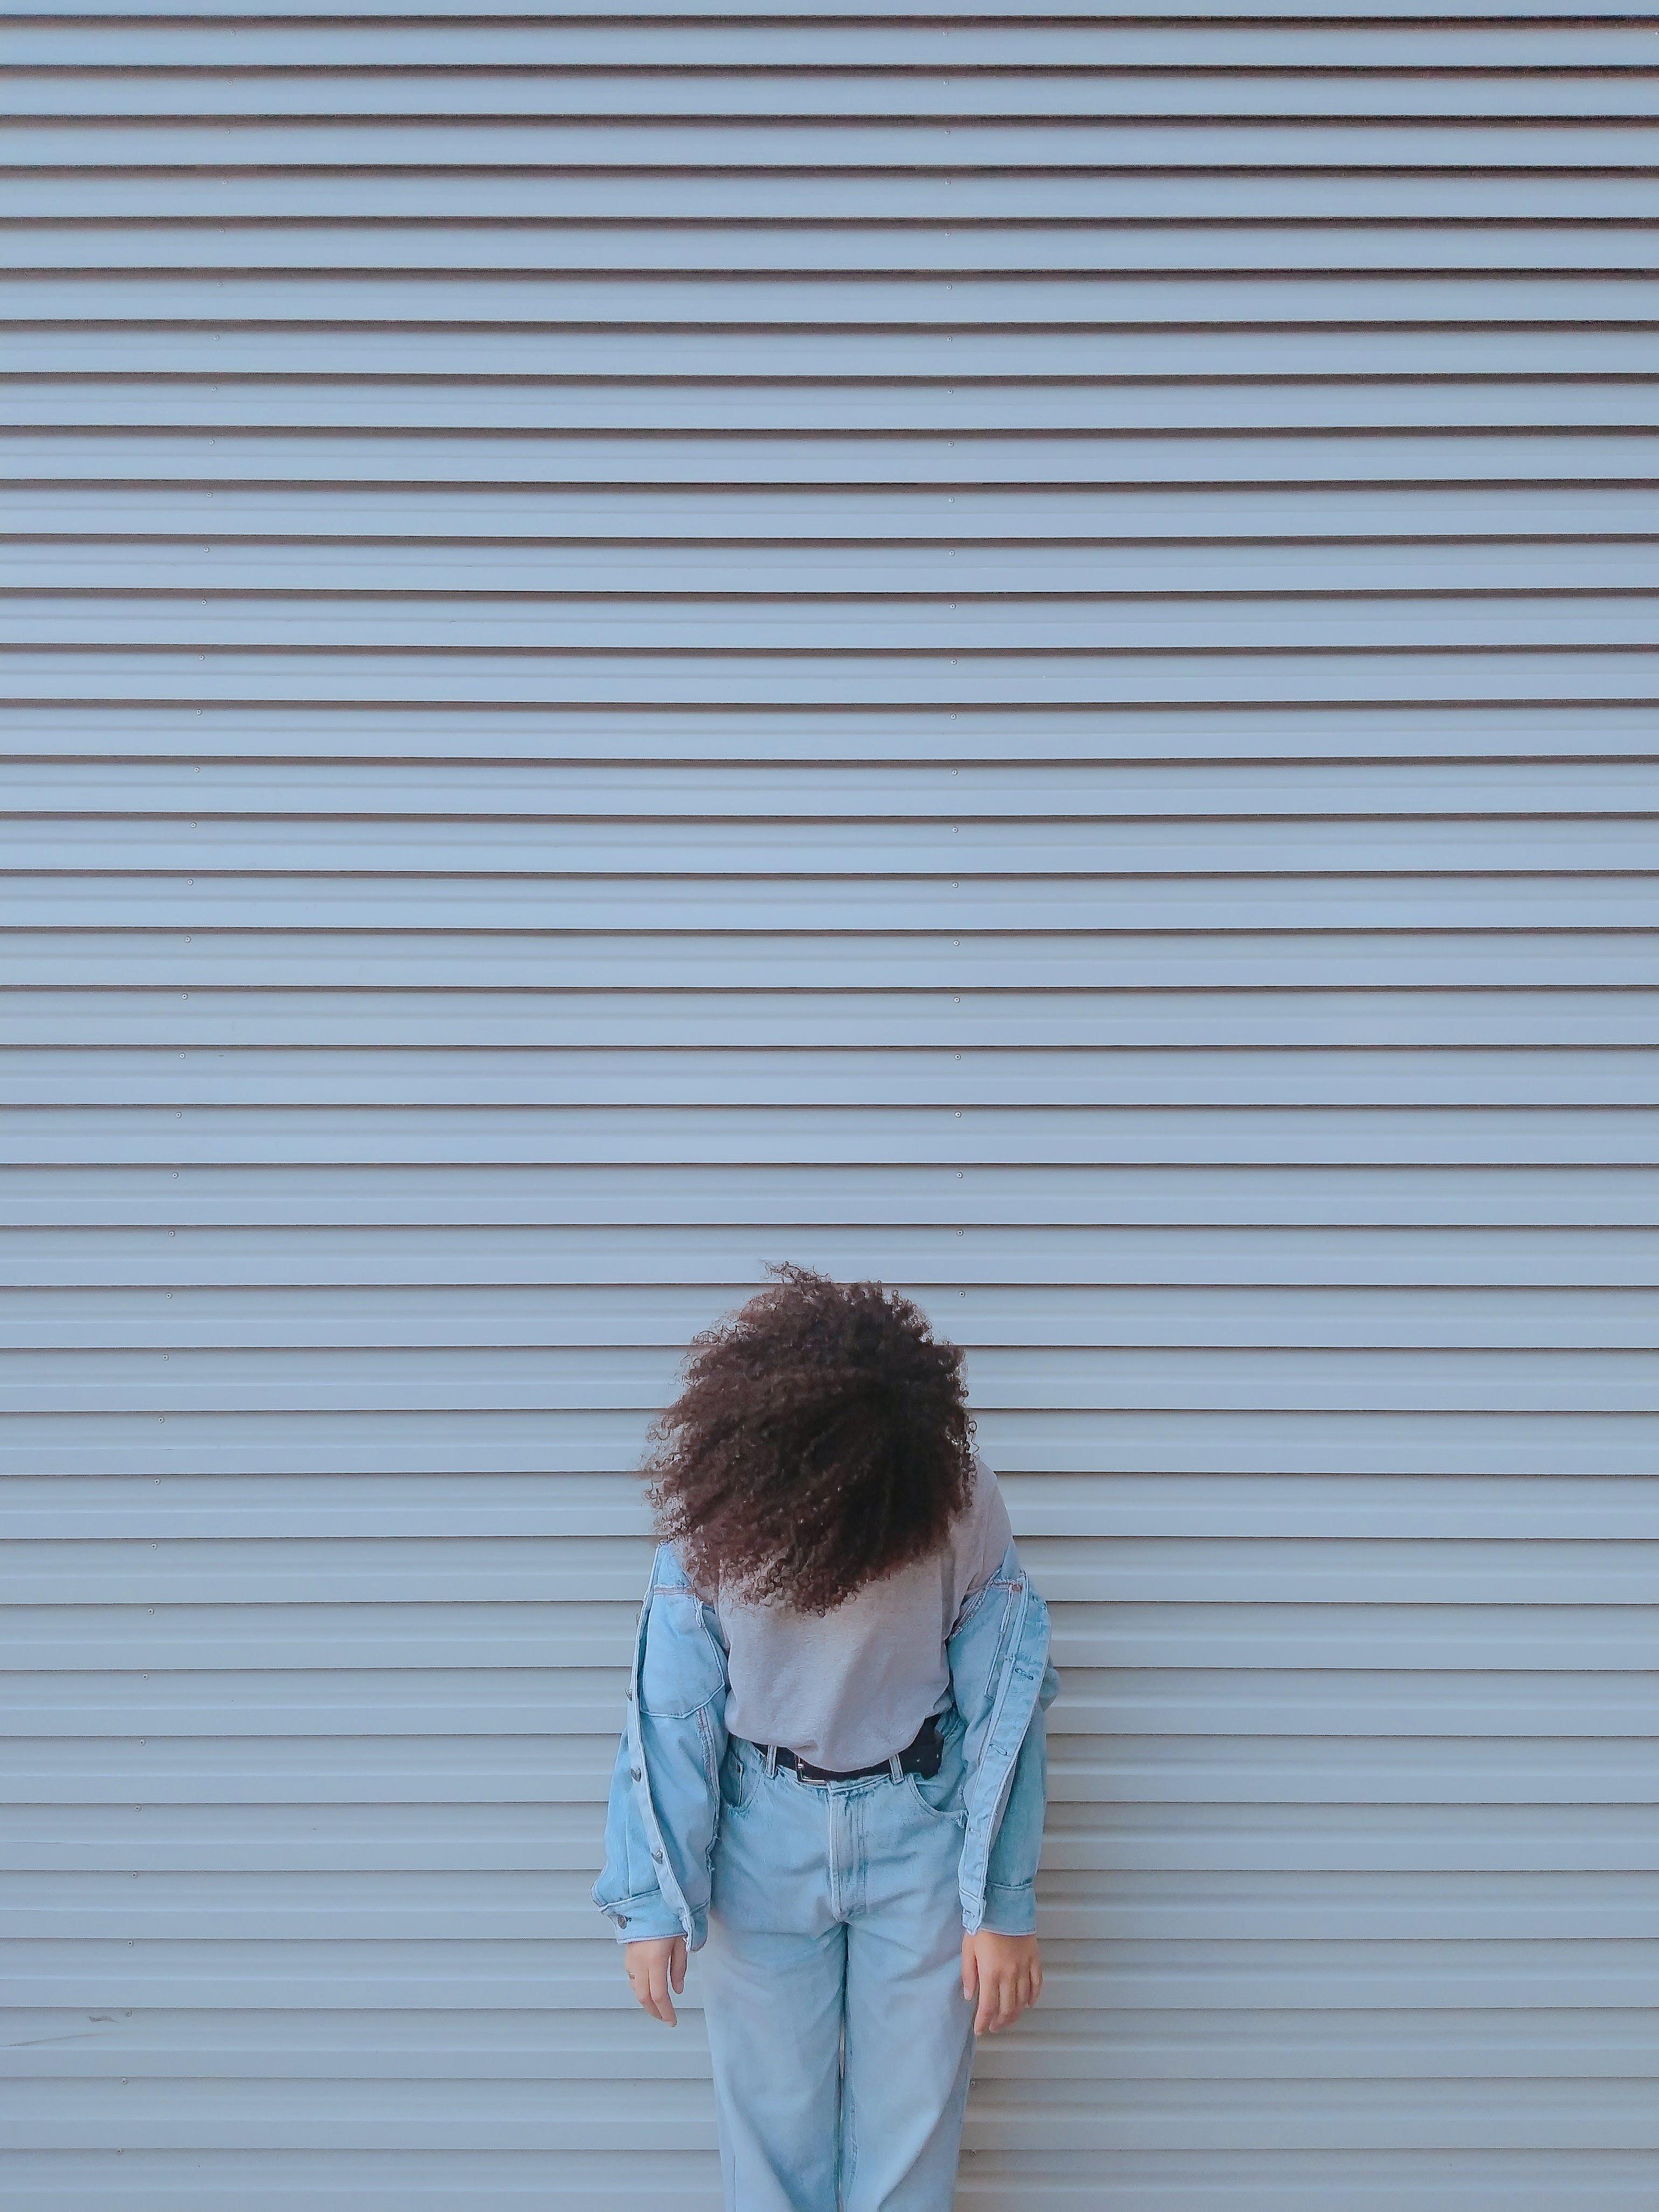 Woman Standing by Closed Shutter Door